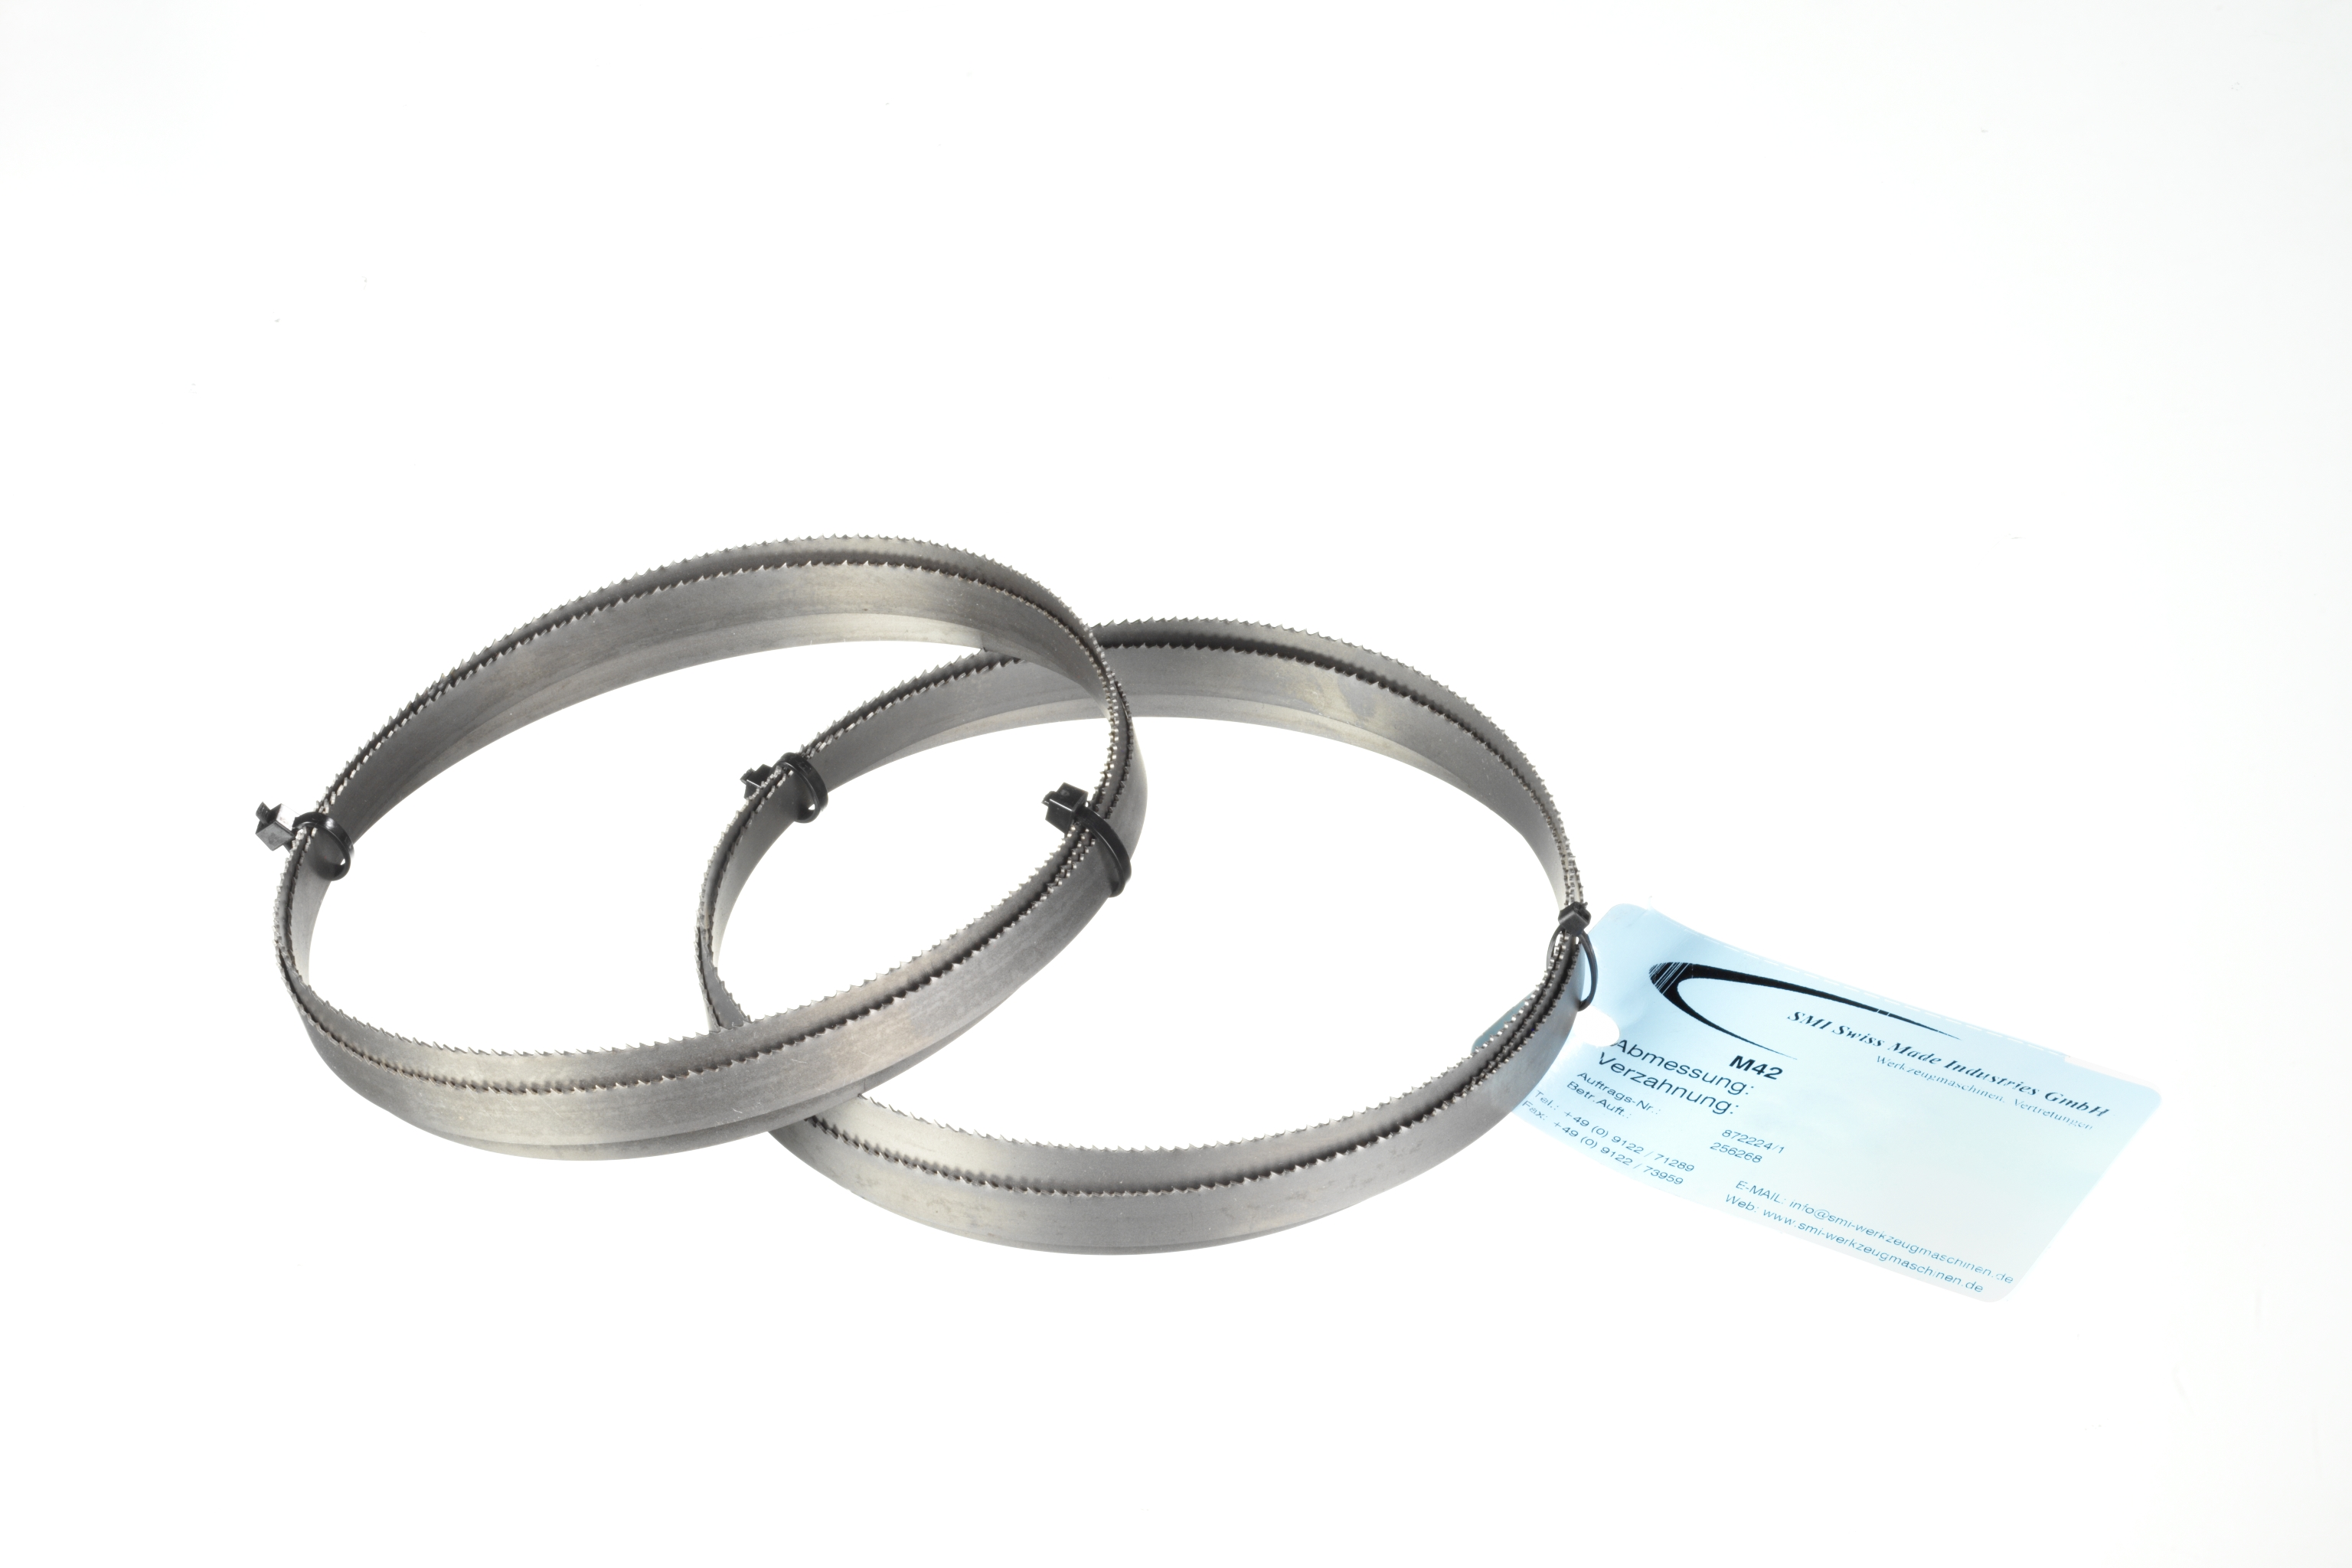 2 x M42 HSS Bimetall S/ägeb/änder S/ägeband 1638 x 13 x 0,65 mm 8//12 ZpZ Edelstahl